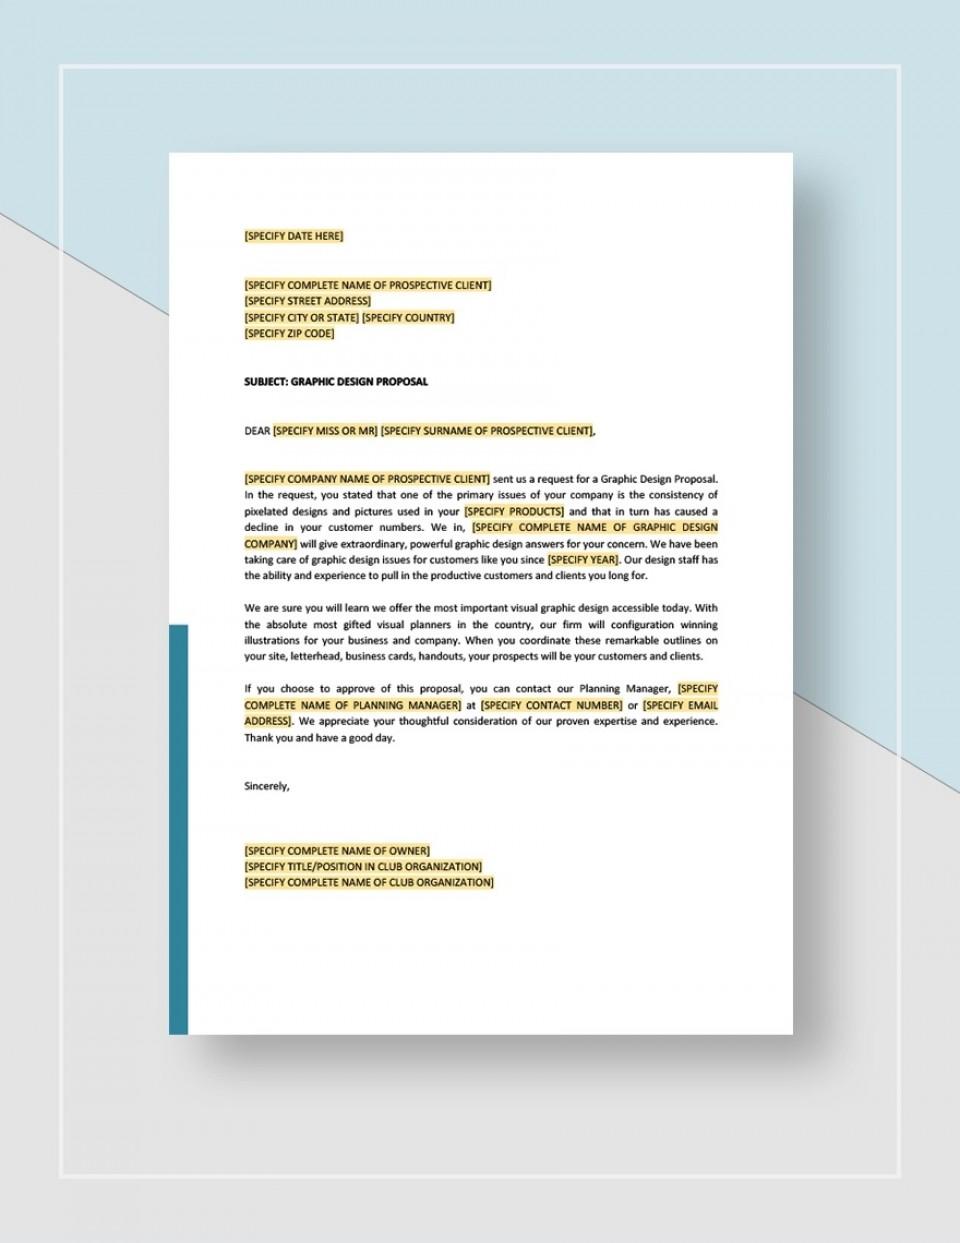 Graphic Design Proposal Template Sample Idea Jpg  Pdf960